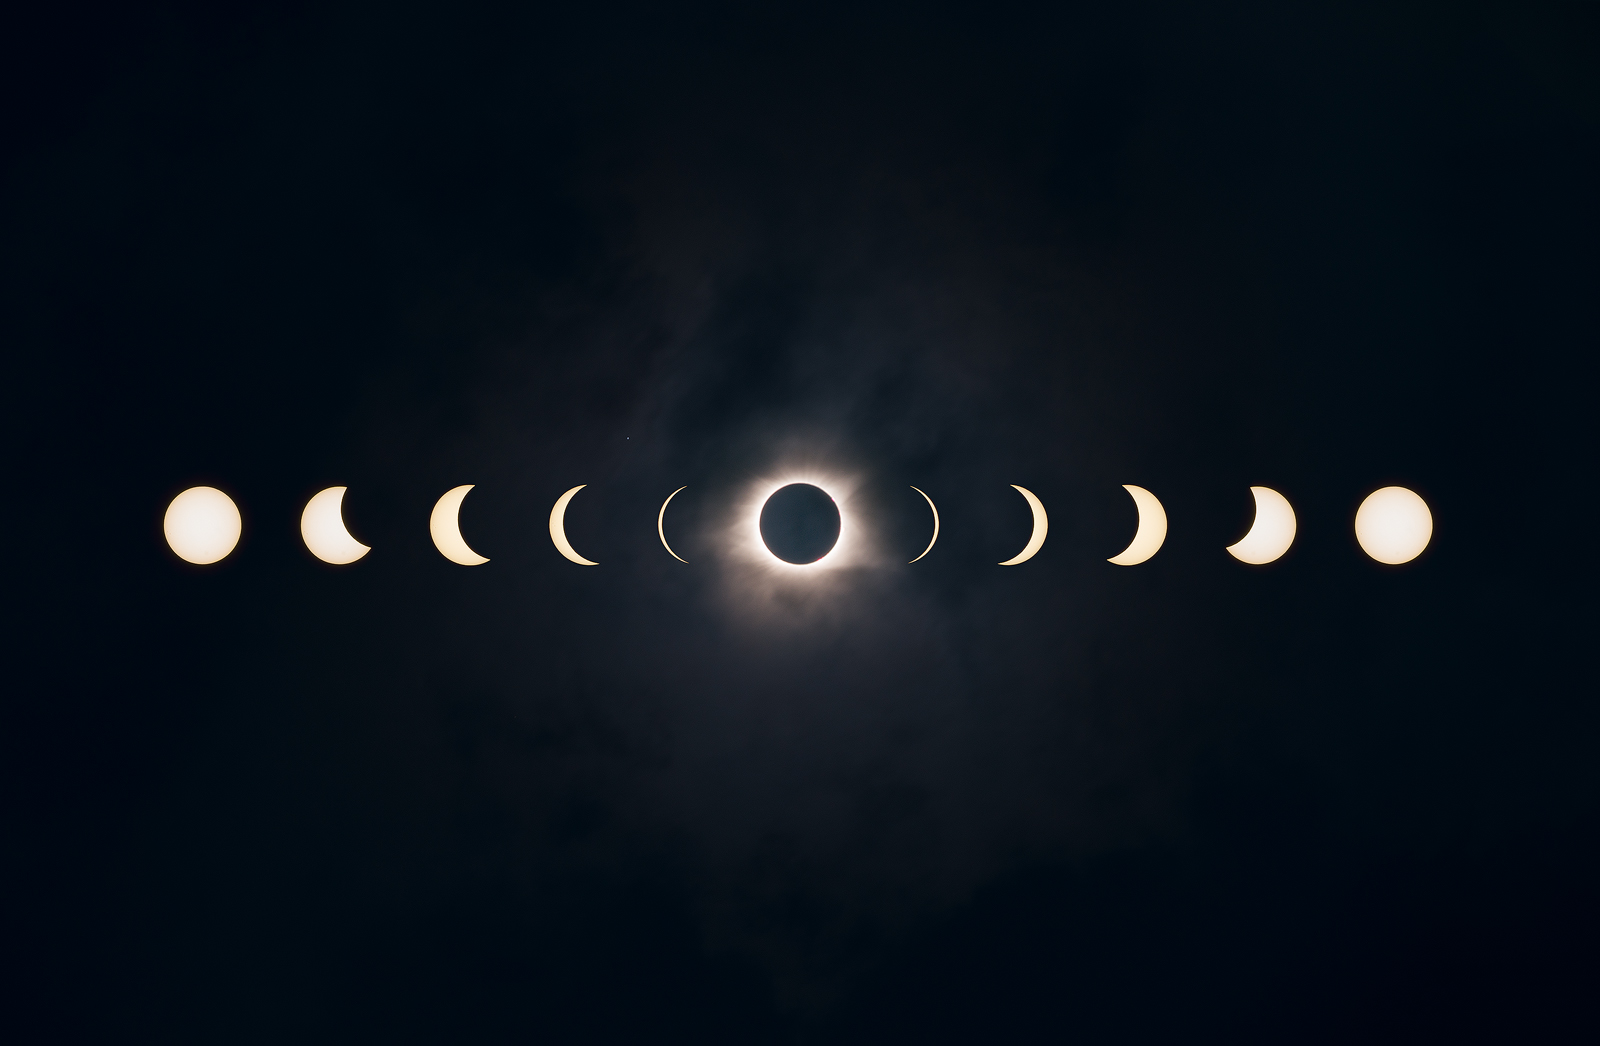 Eclipse-Whole.jpg